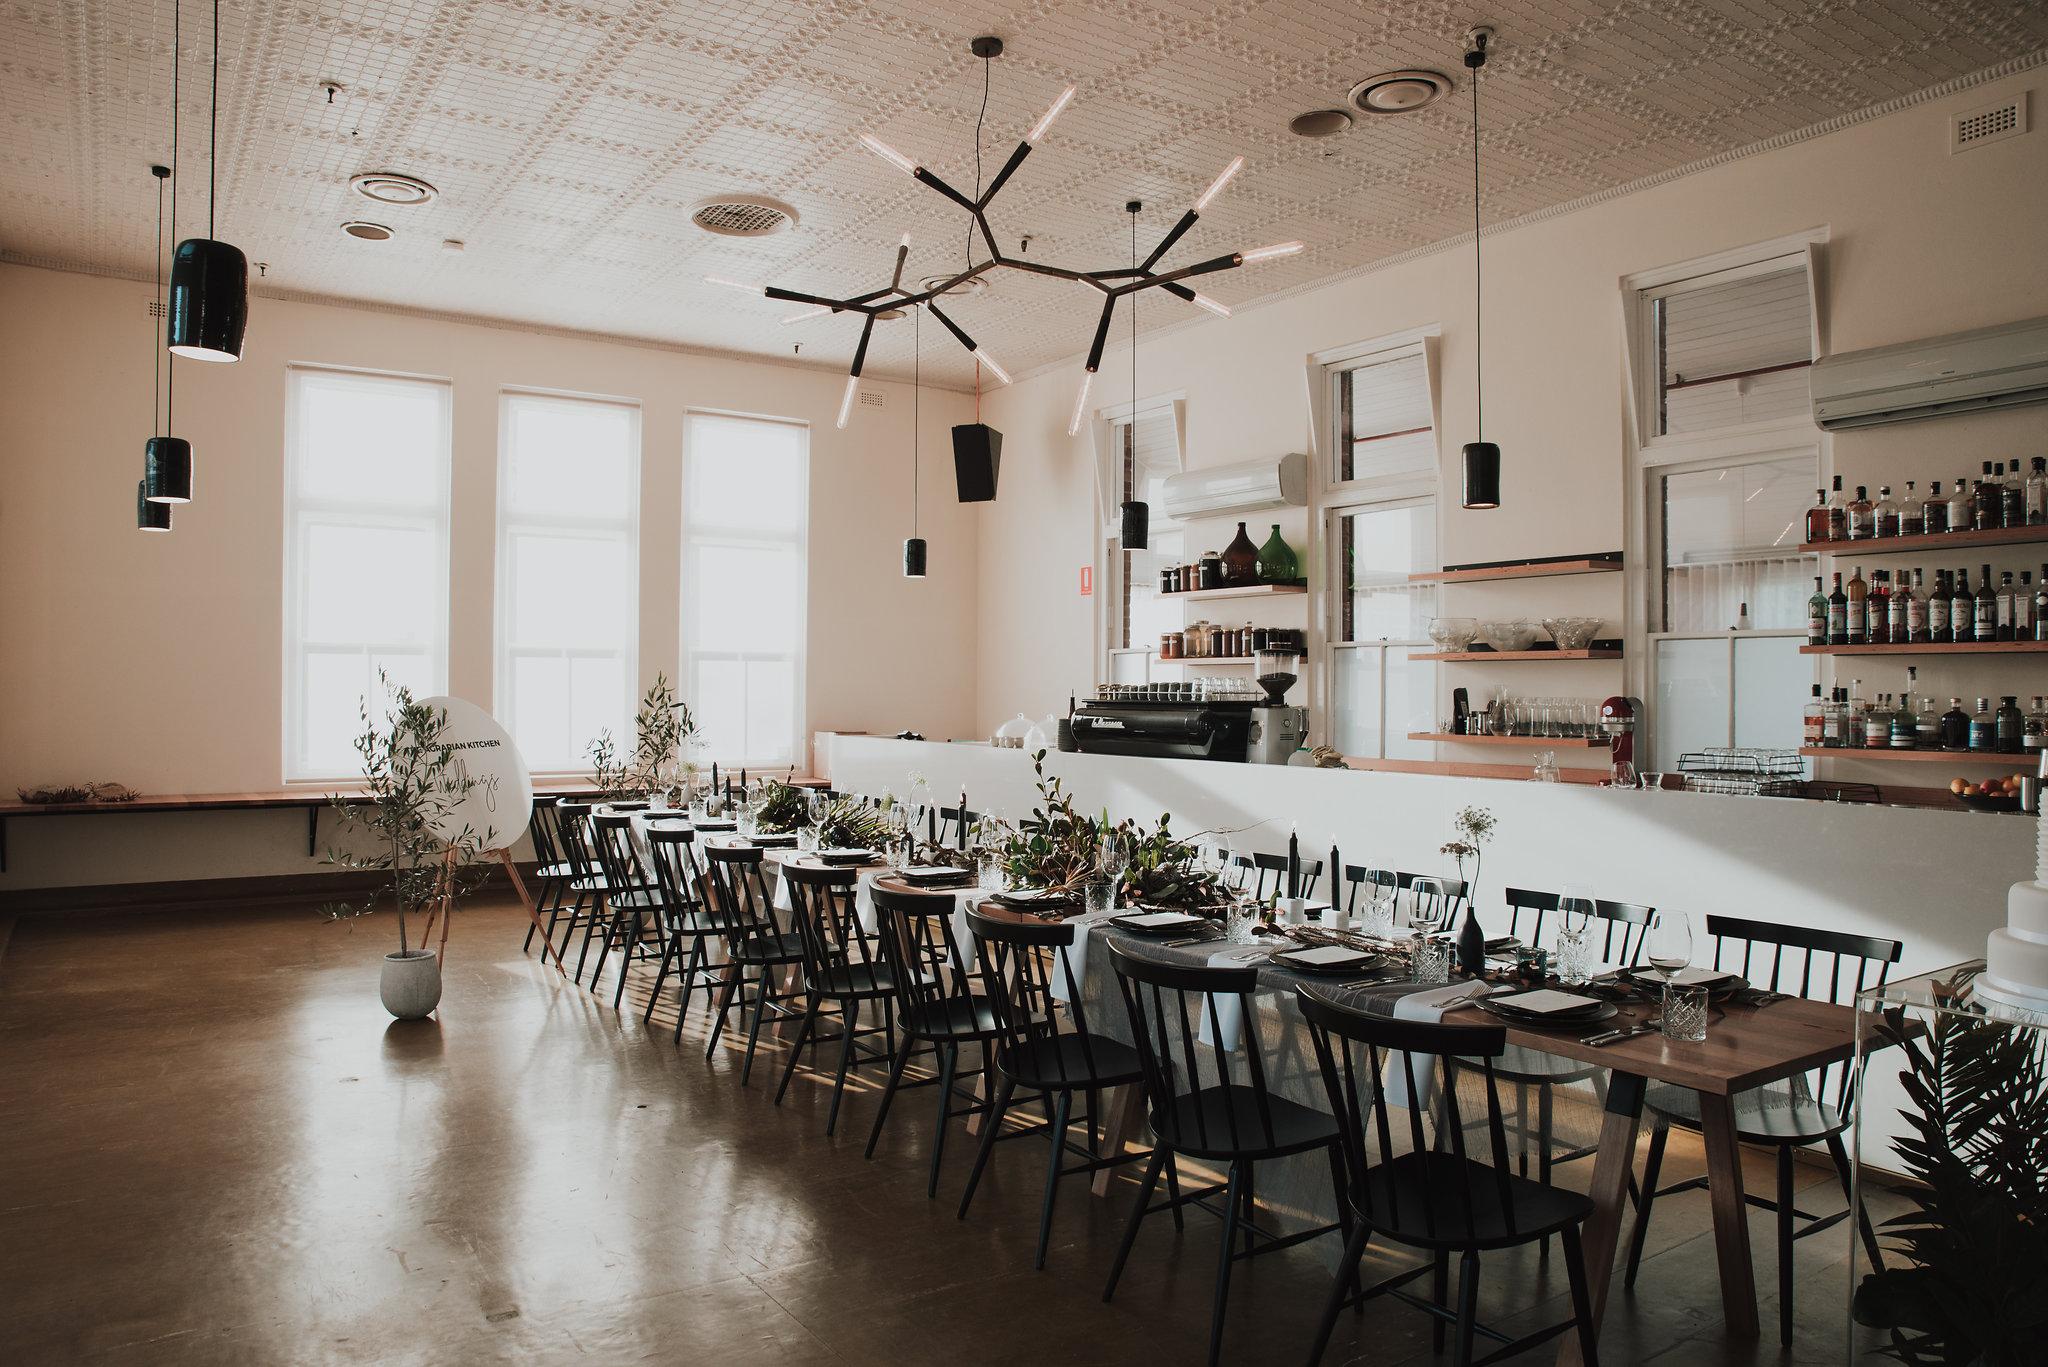 styled-shoot-agrarian-kitchen-4.jpg